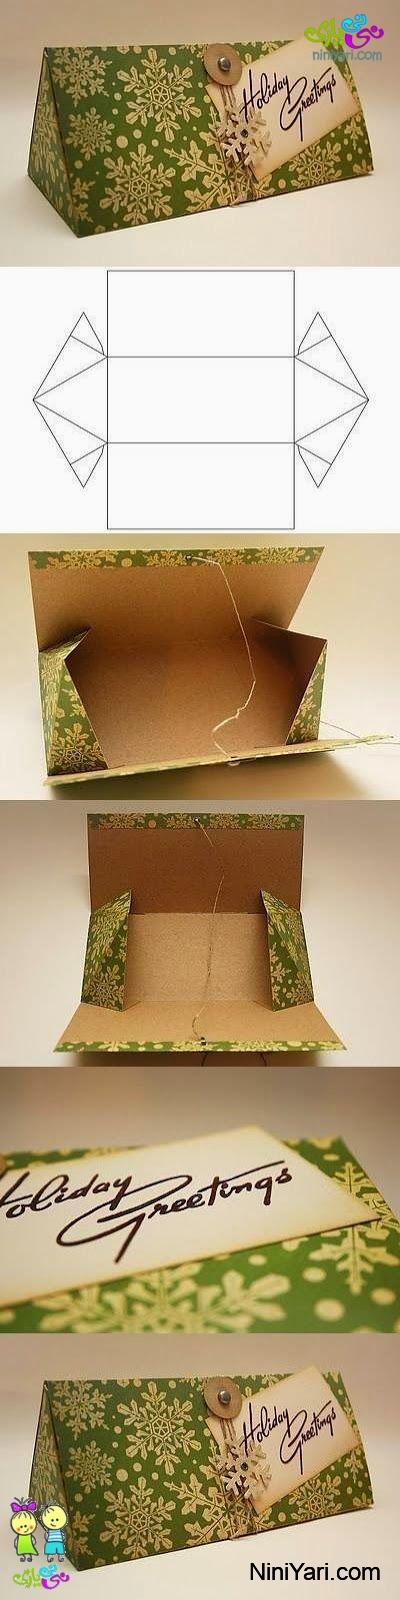 الگوی جعبه کادویی